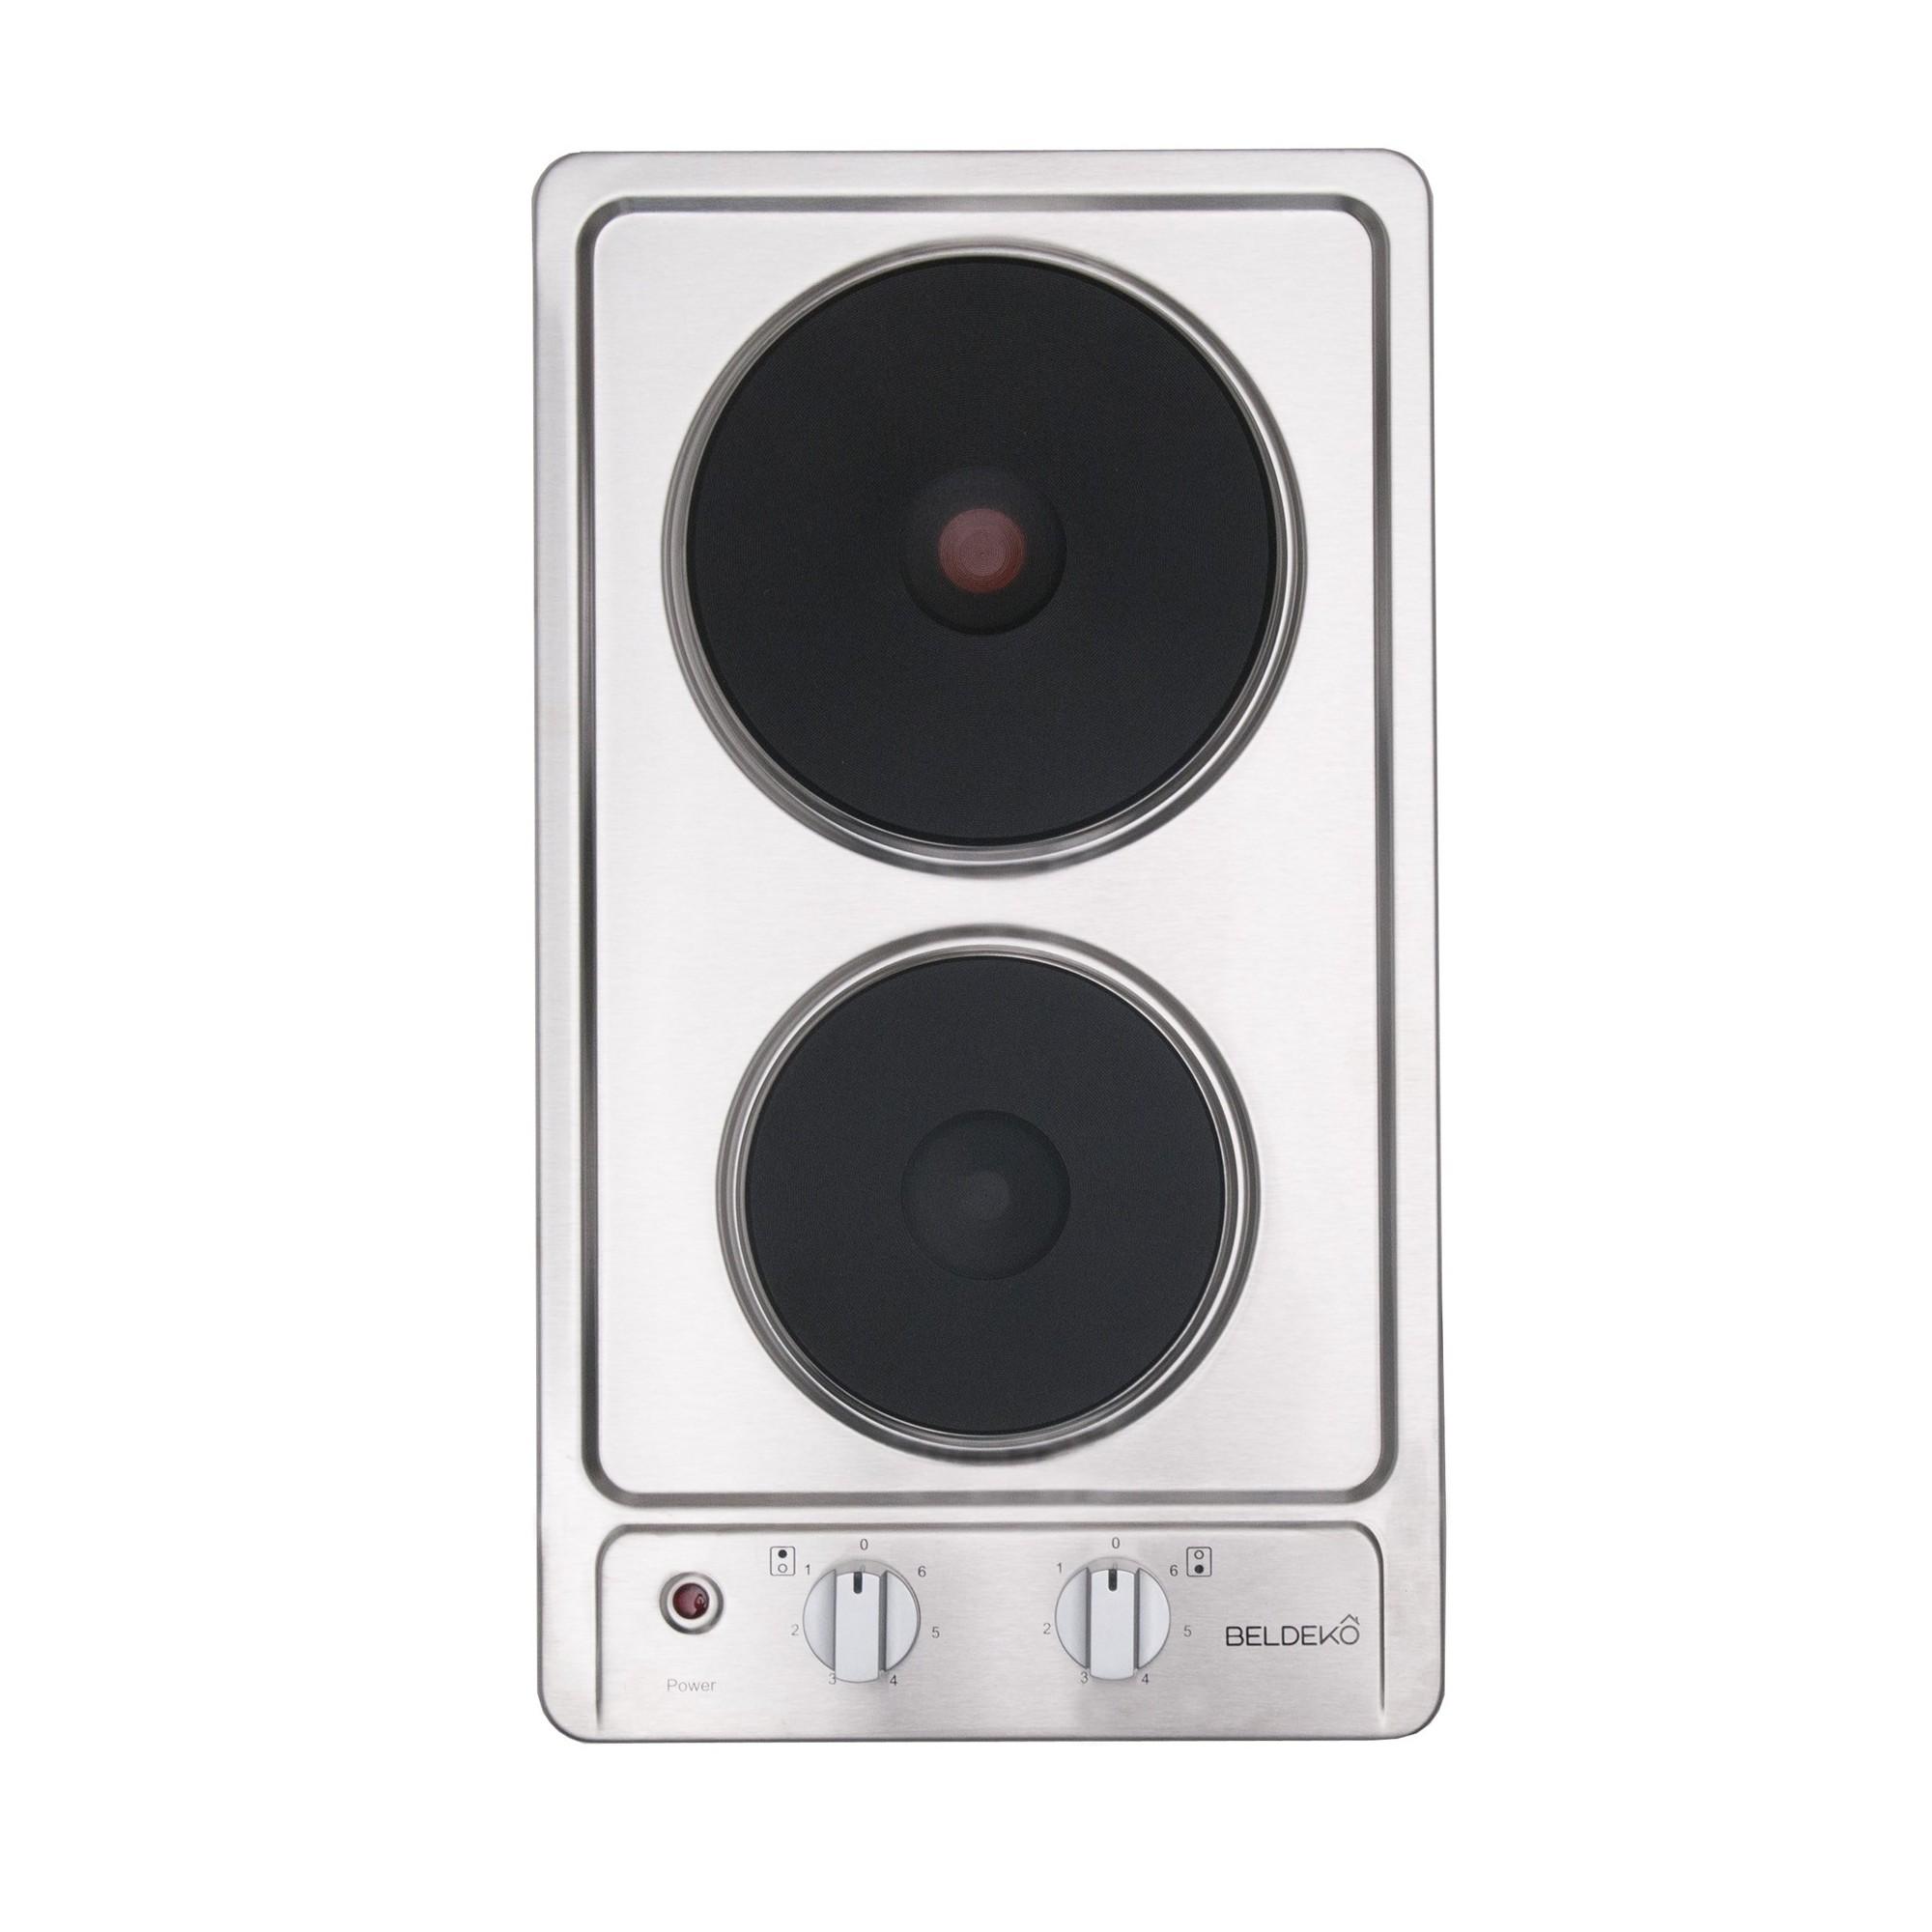 http://www.bbplace.fr/196-701-thickbox/domino-electrique-2-feux-2-foyers-plaque-electrique.jpg